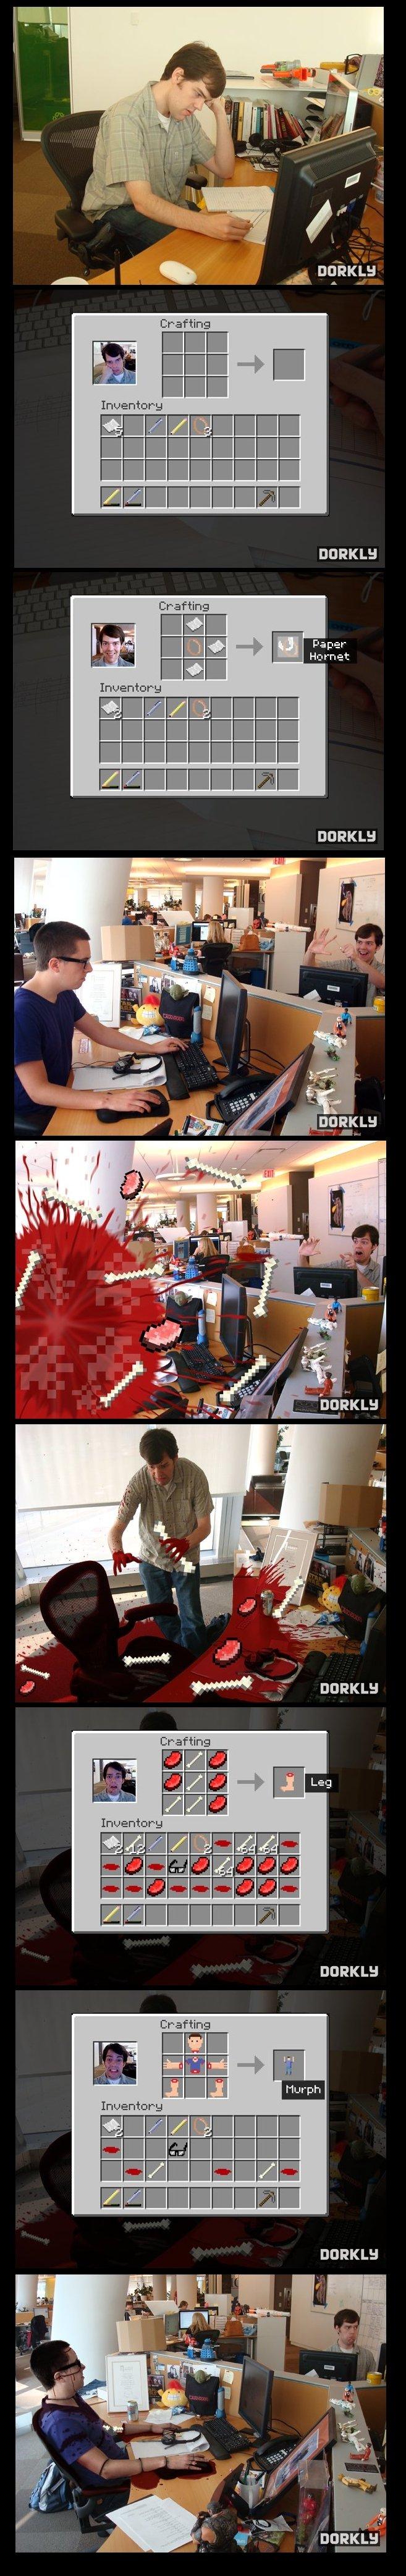 http://img.niceminecraft.net/Funny/Office-Minecraft.jpg